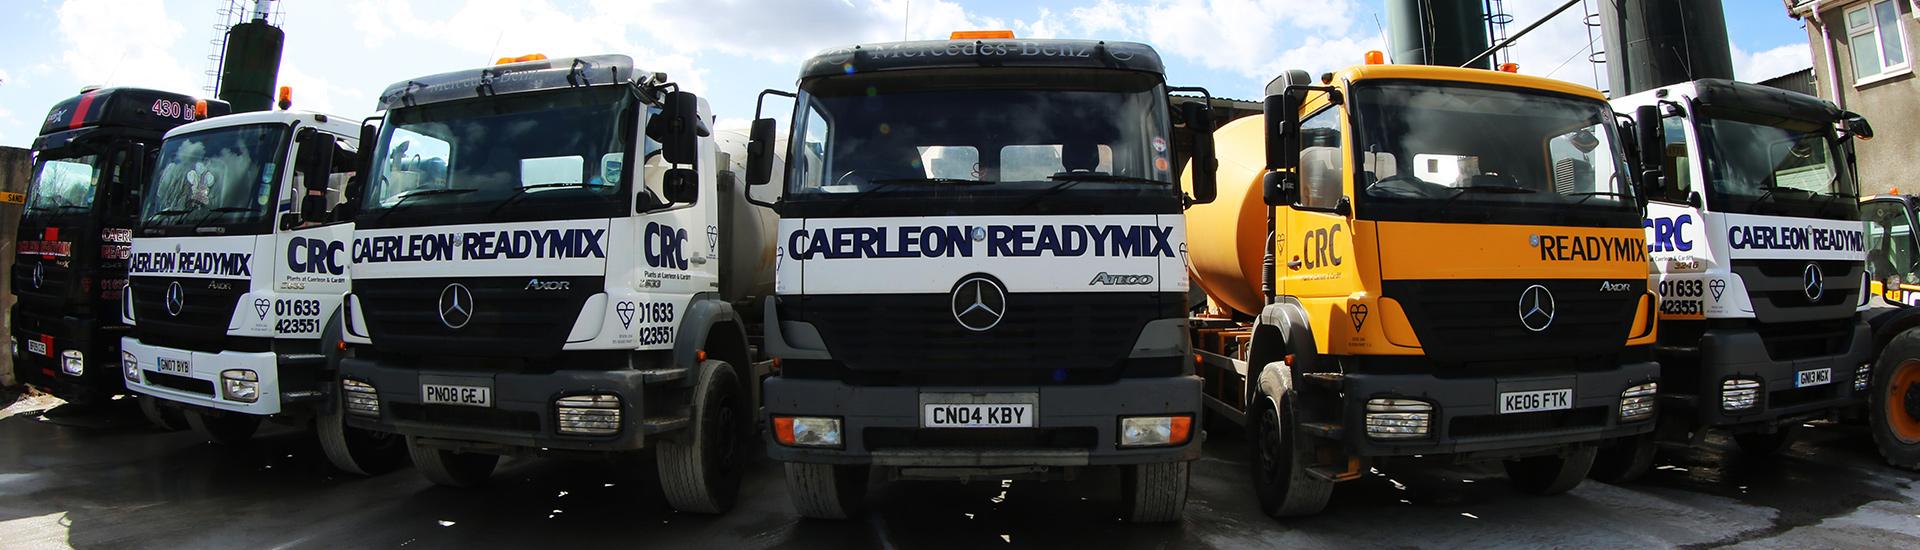 CaerleonRC-HomeSlider_001